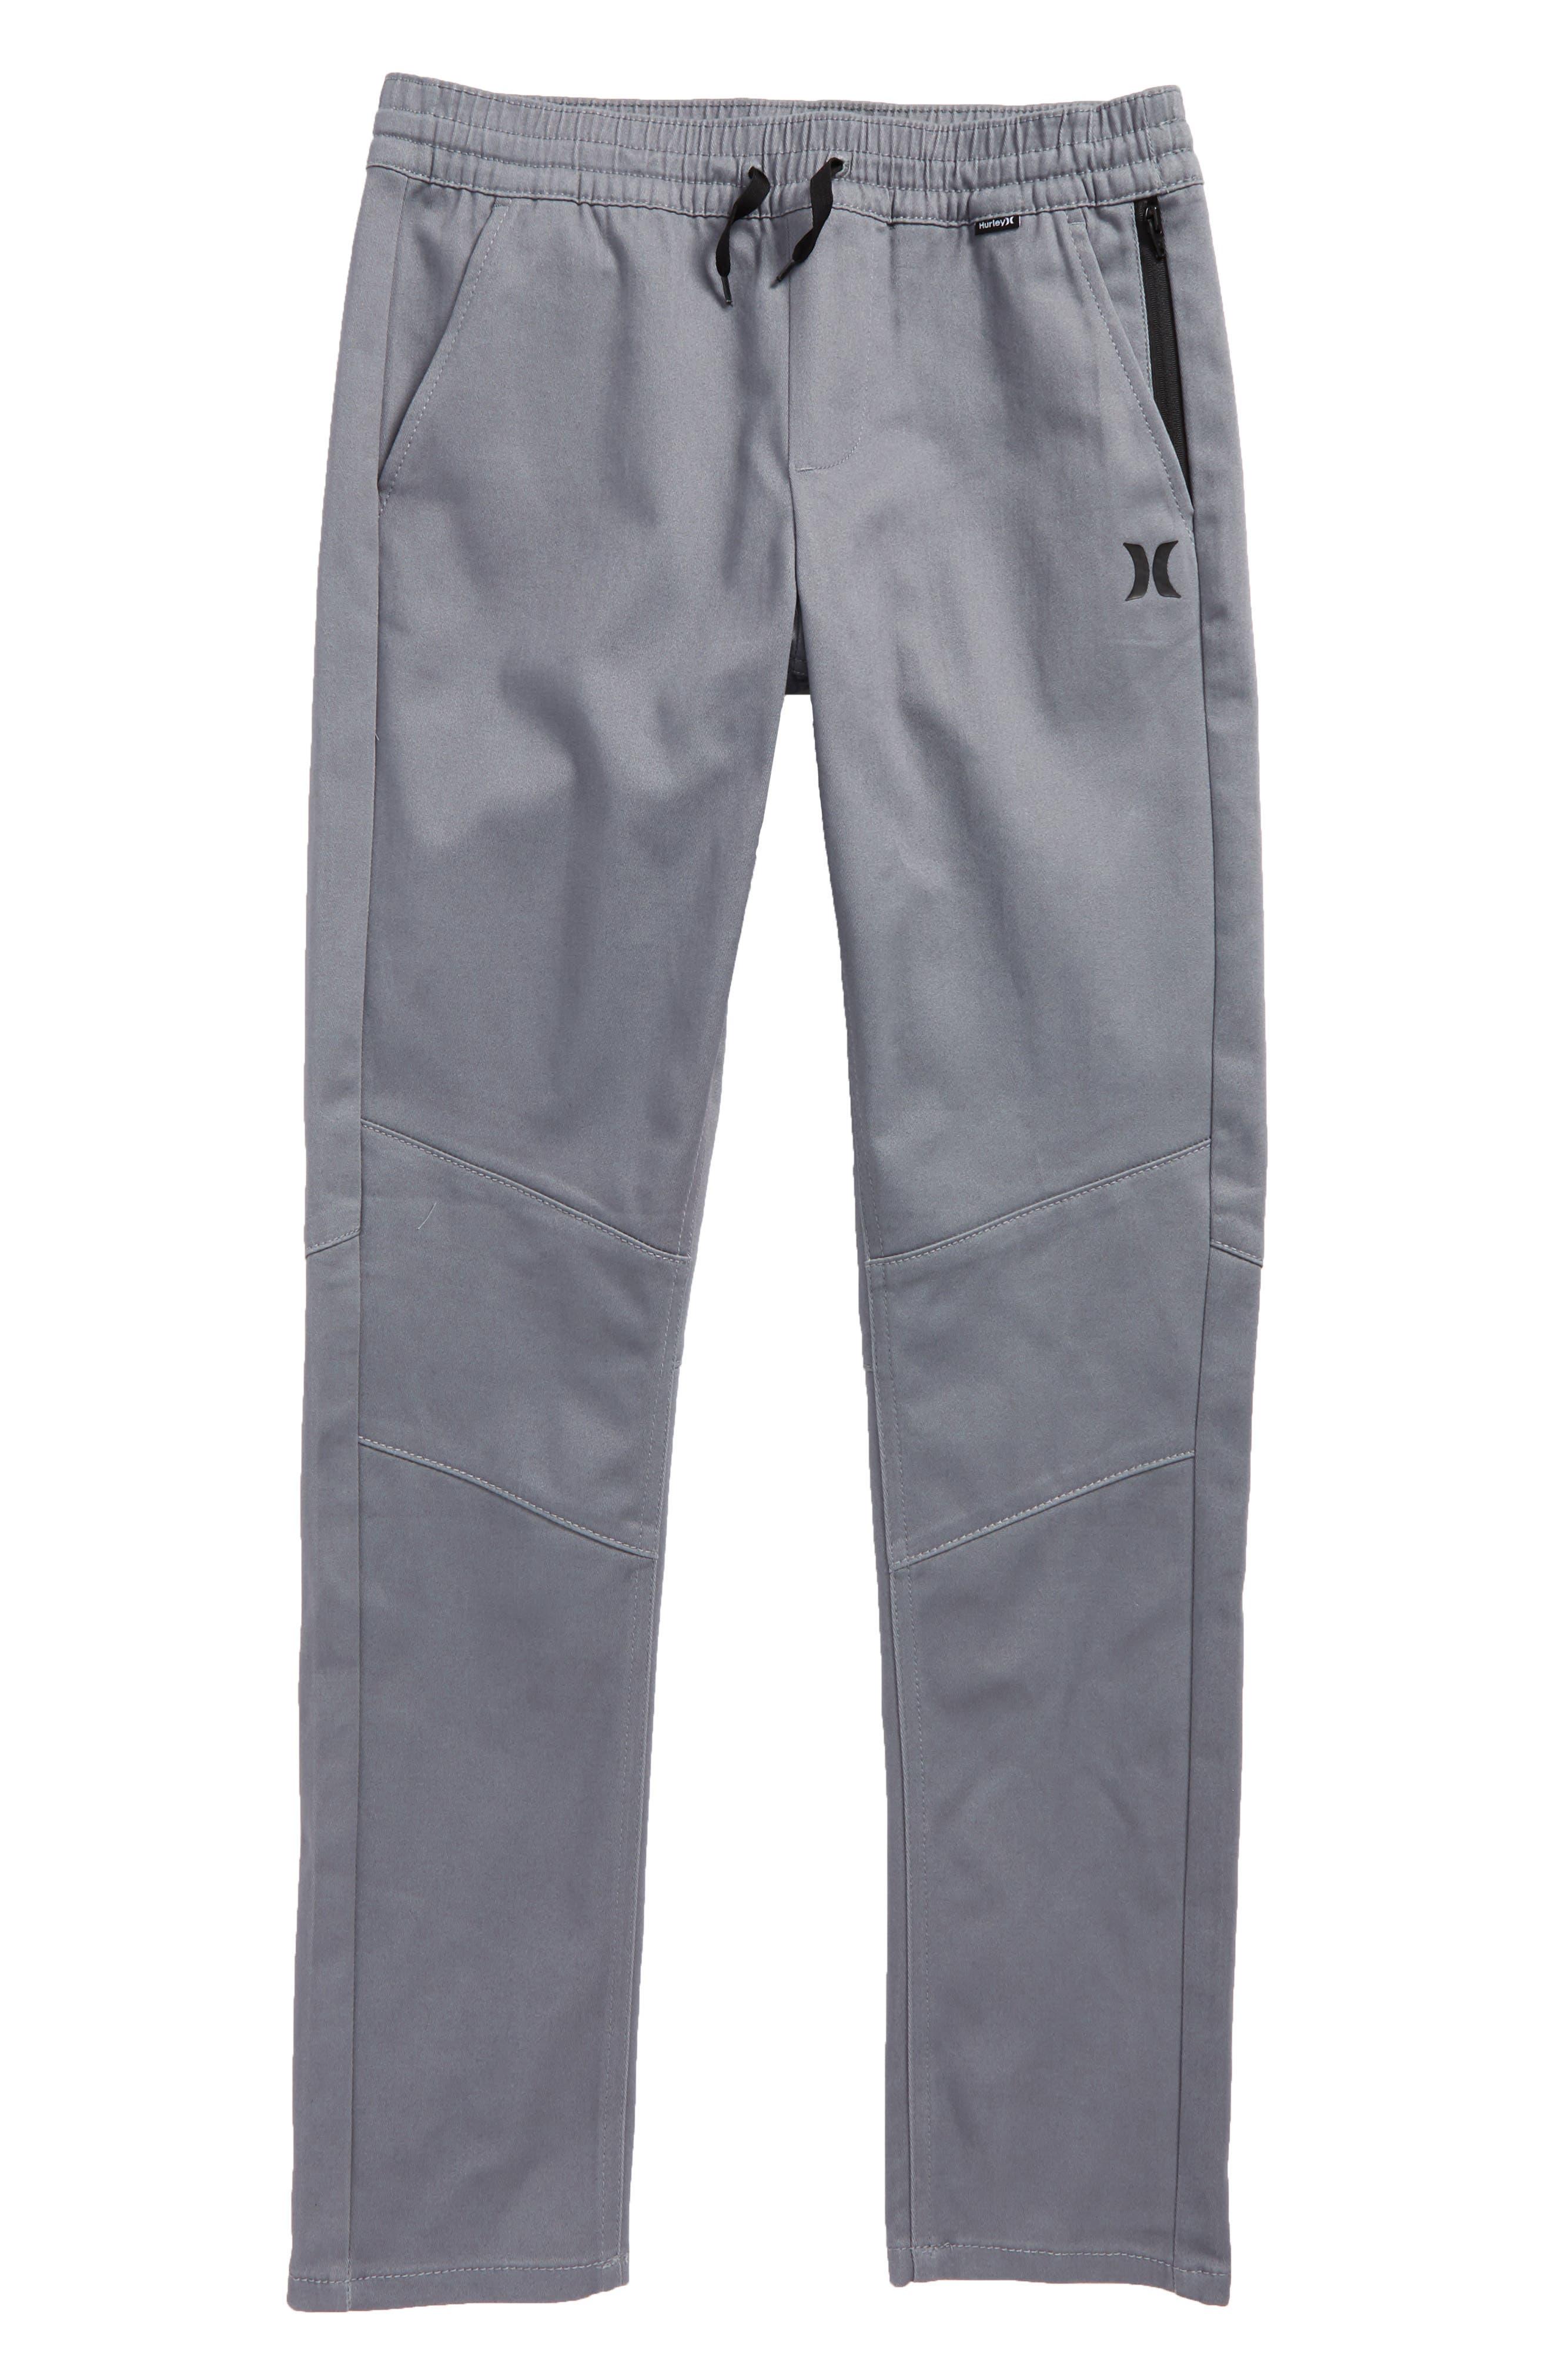 Main Image - Hurley Dri-FIT Tapered Track Pants (Big Boys)